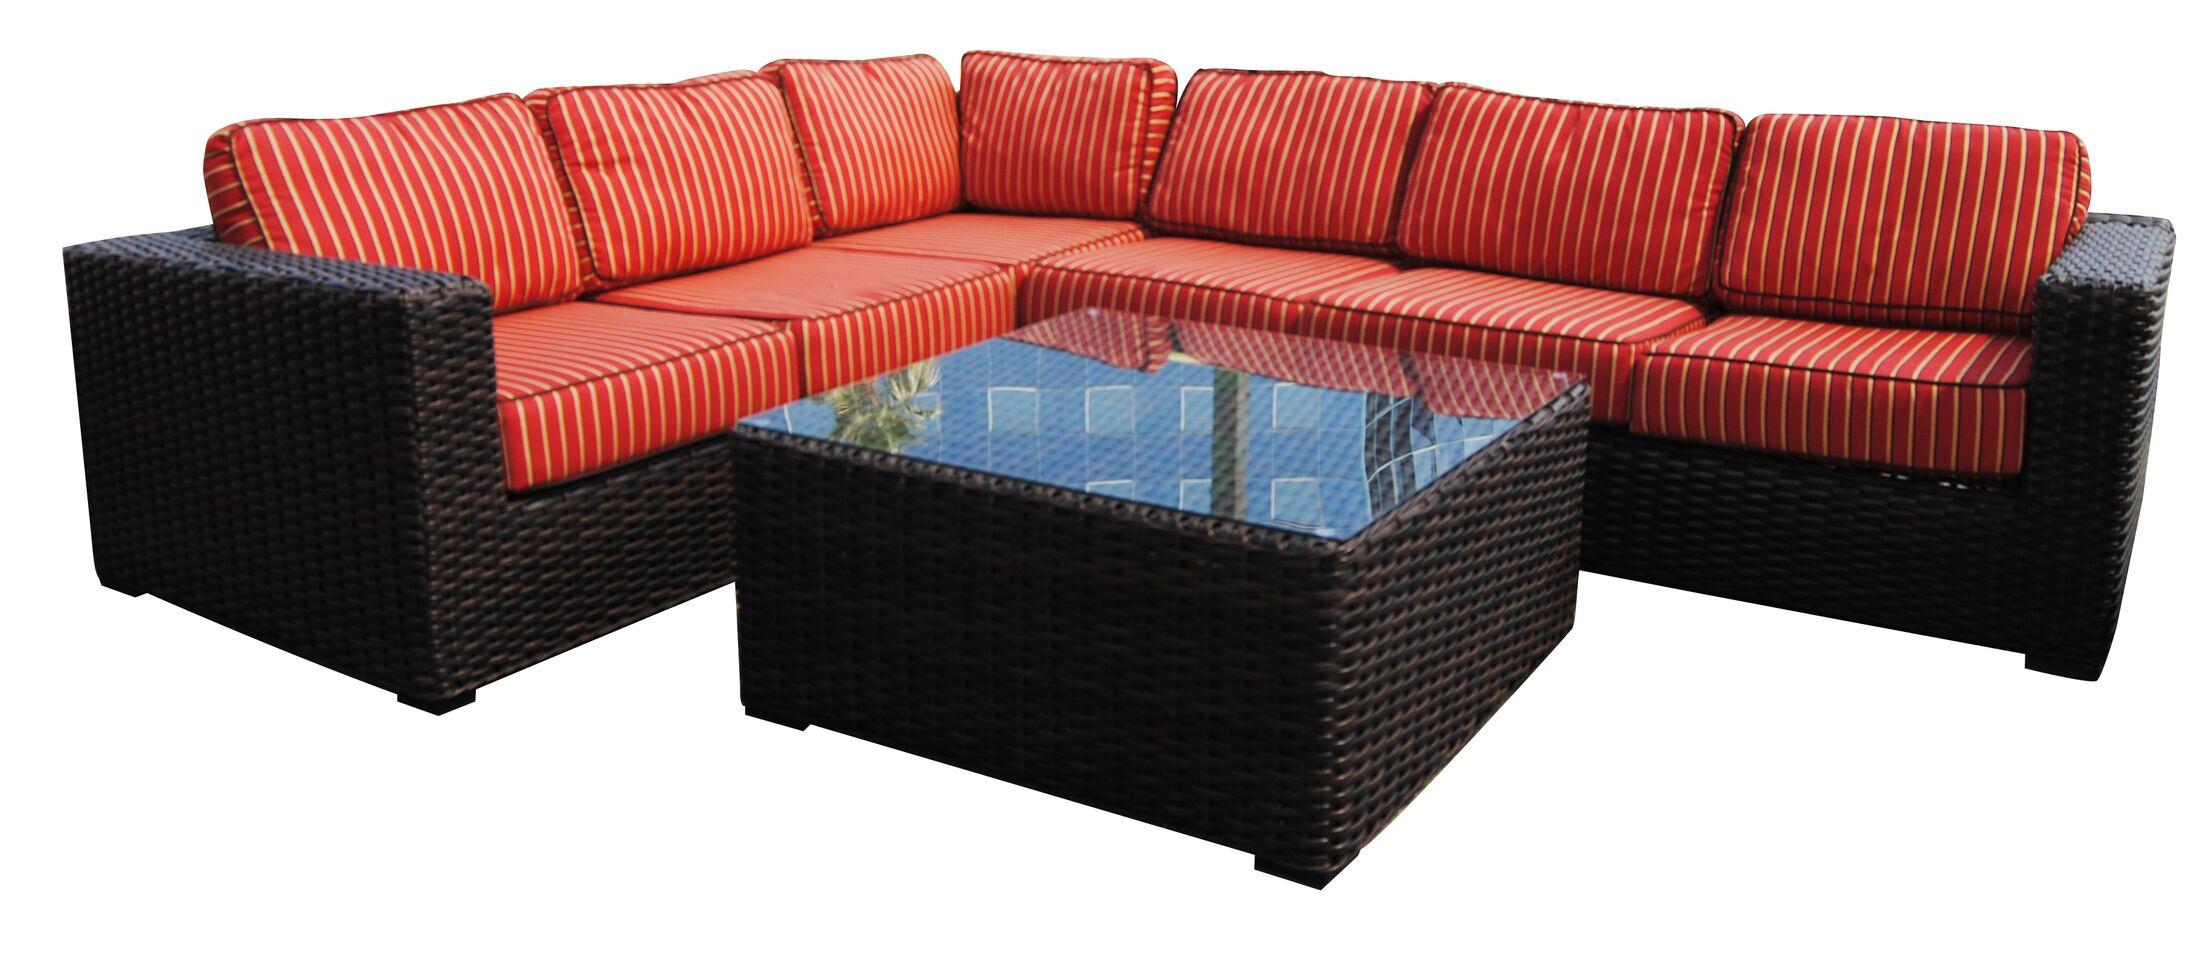 Santa Monica 5 piece Sunbrella Sectional Set with Cushions Fabric: Straw Linen